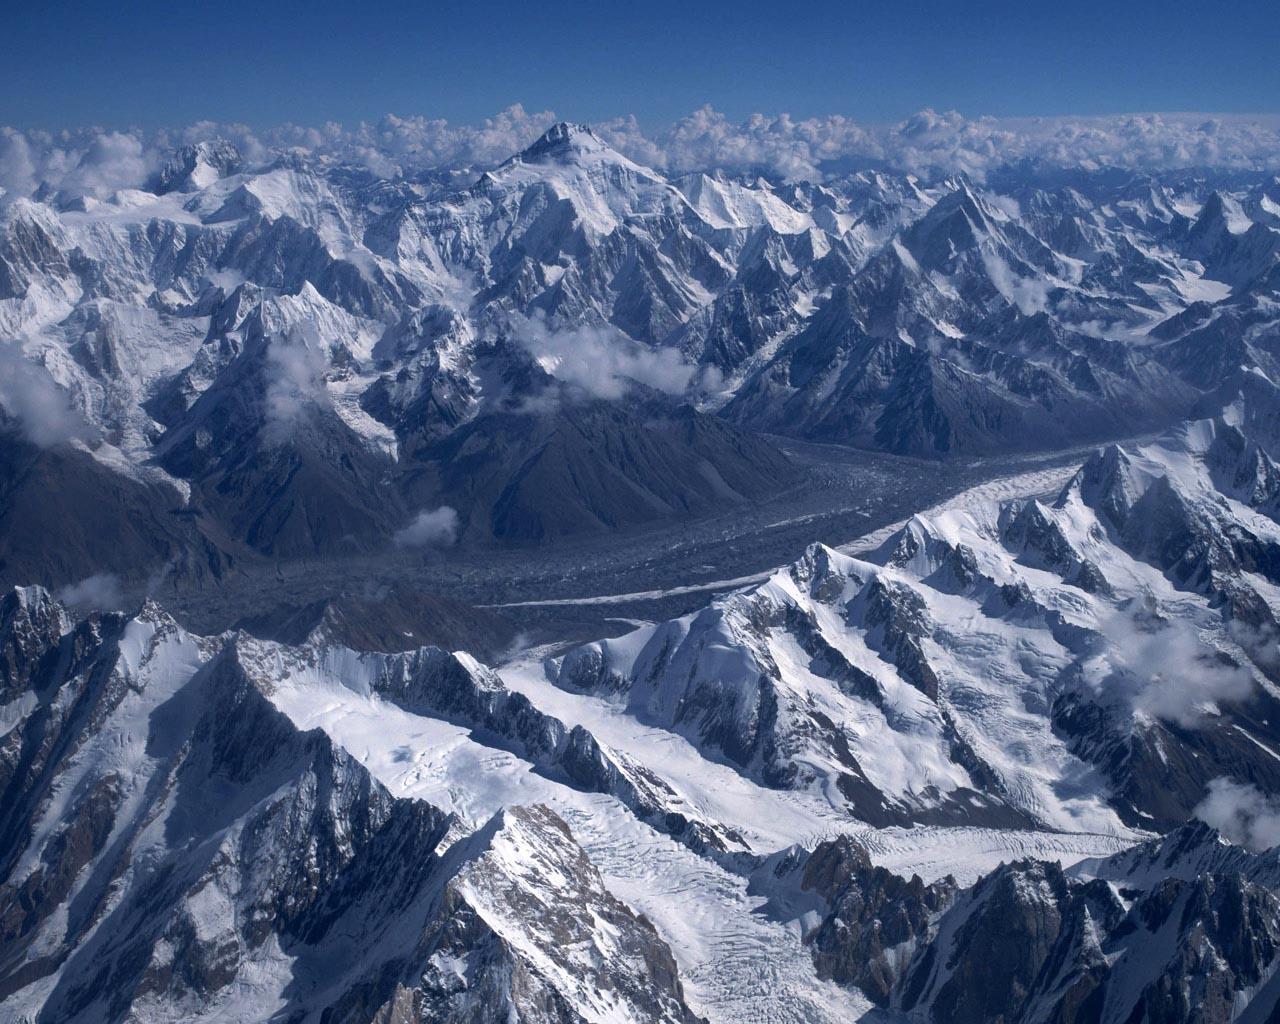 壮大な雪山景色   無料壁紙の画像   261